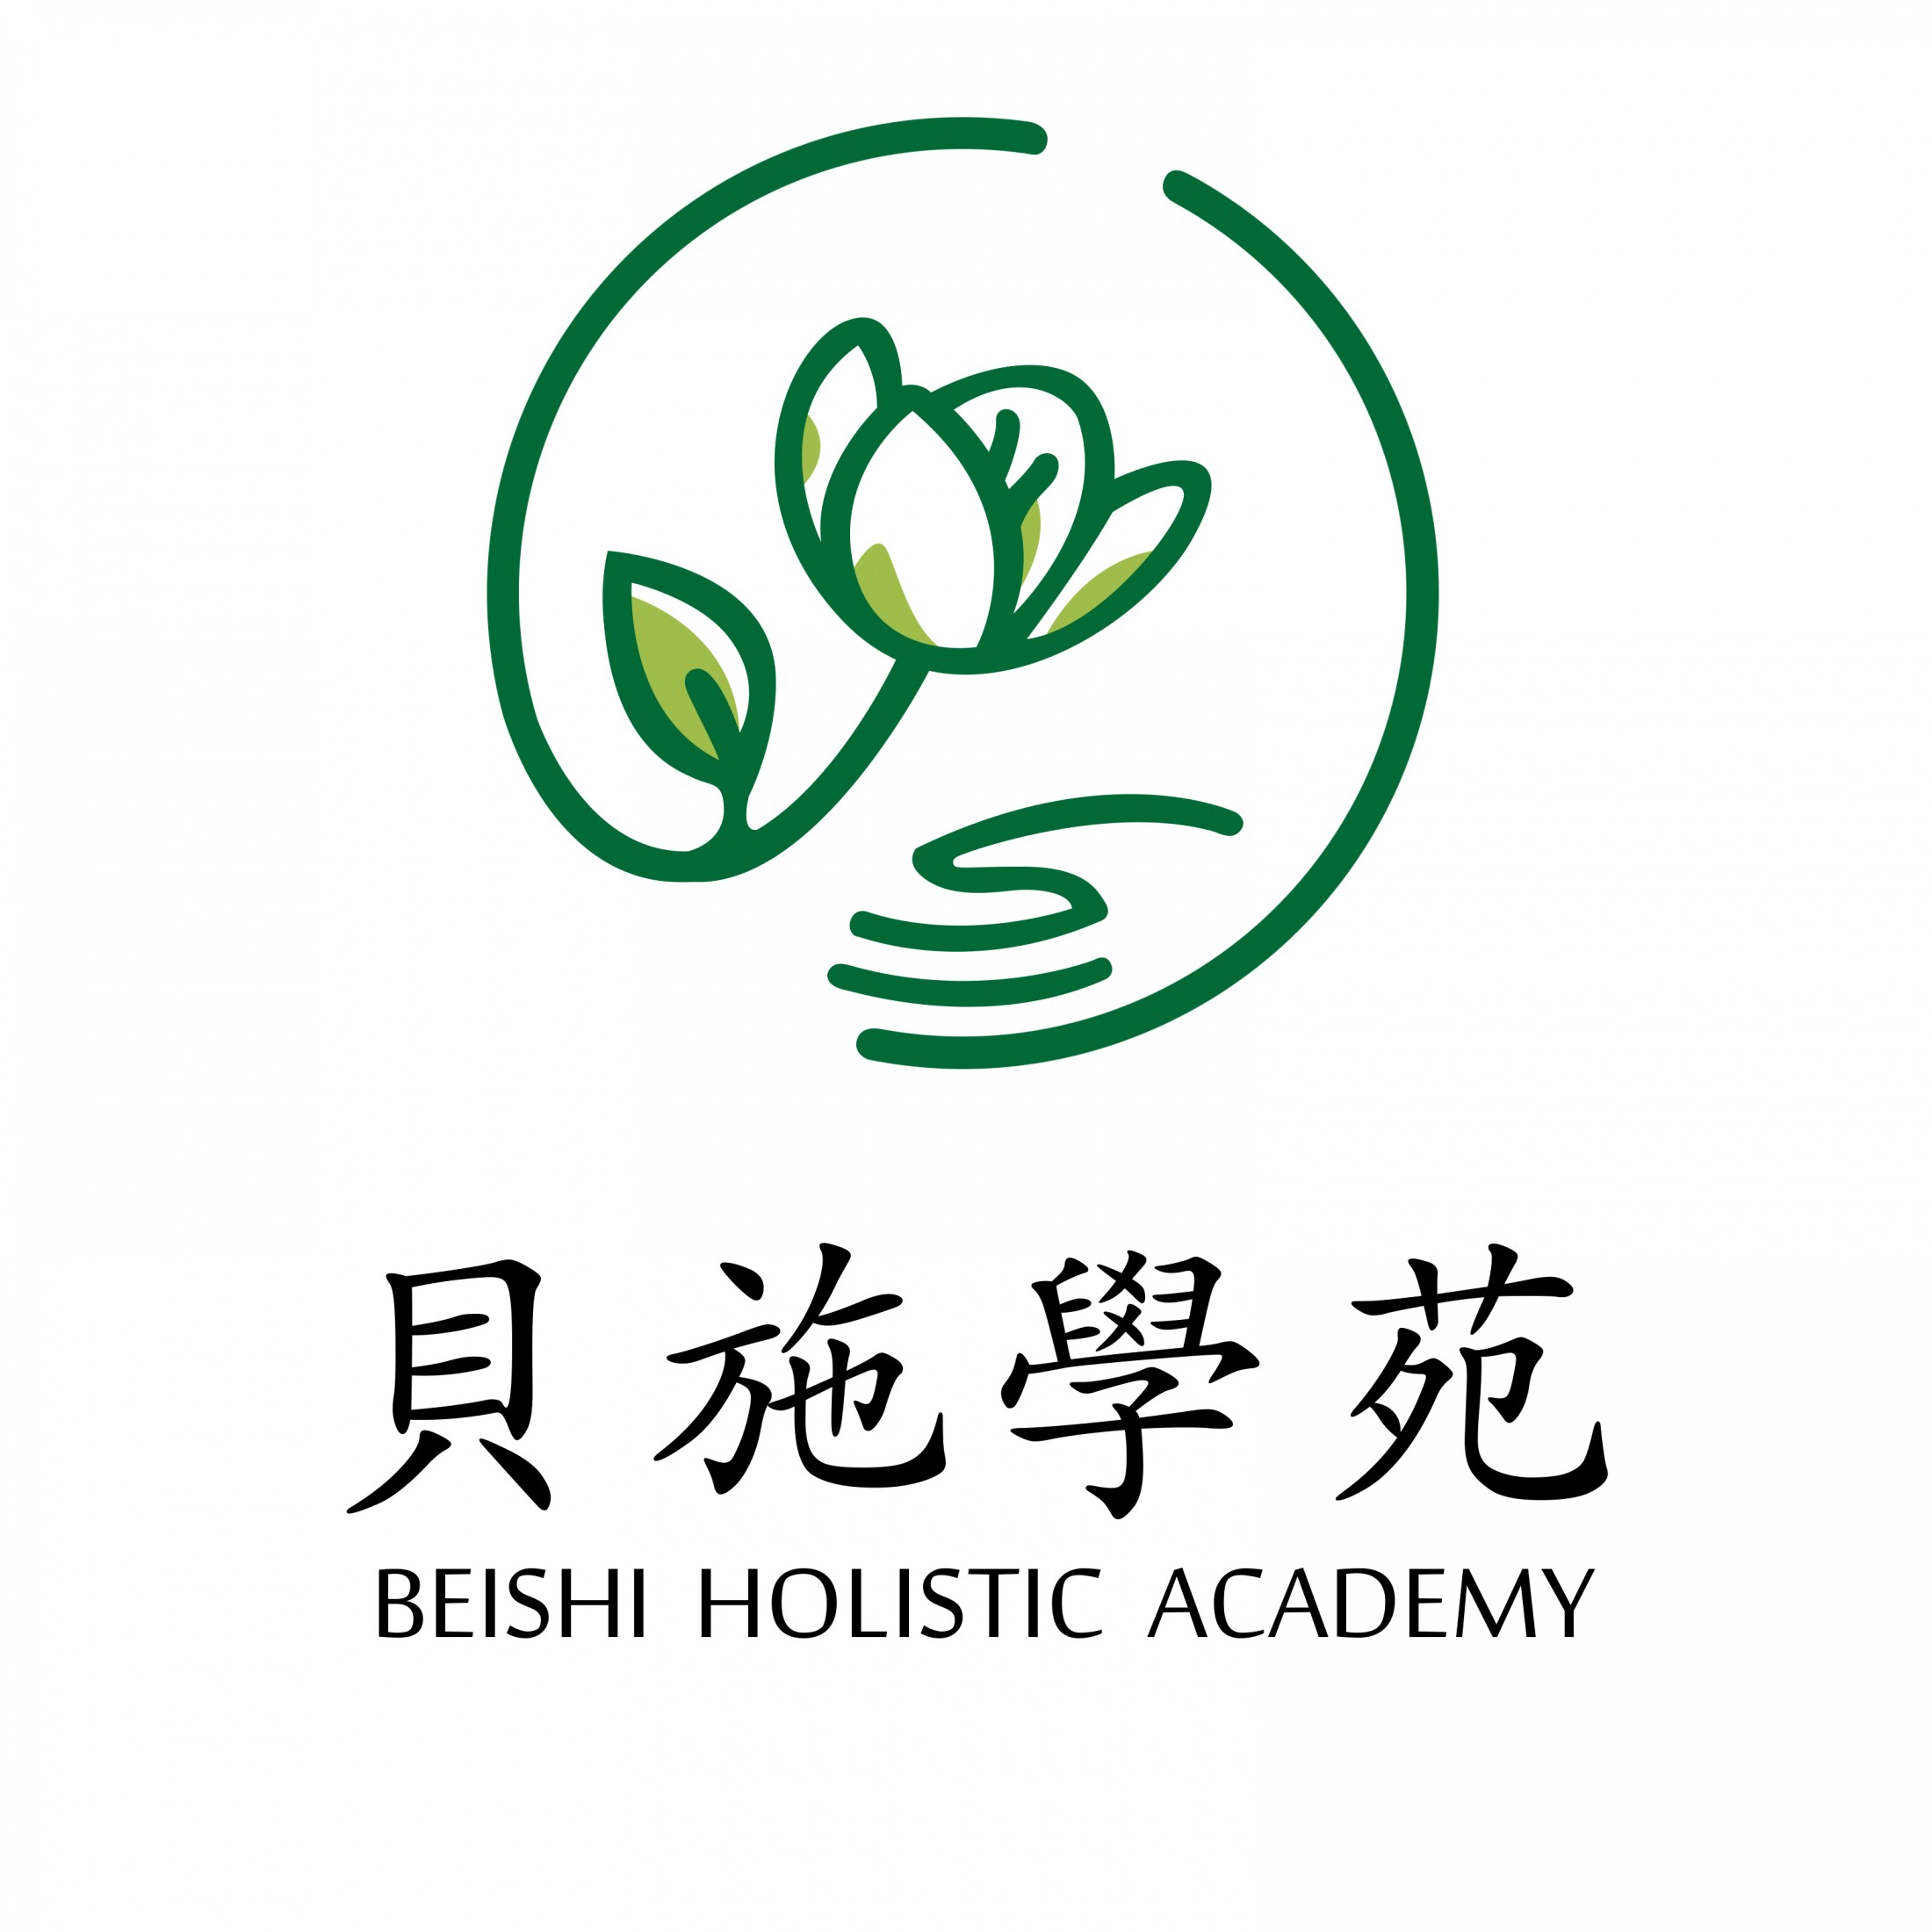 BEISHI HOLISTIC ACADAMY